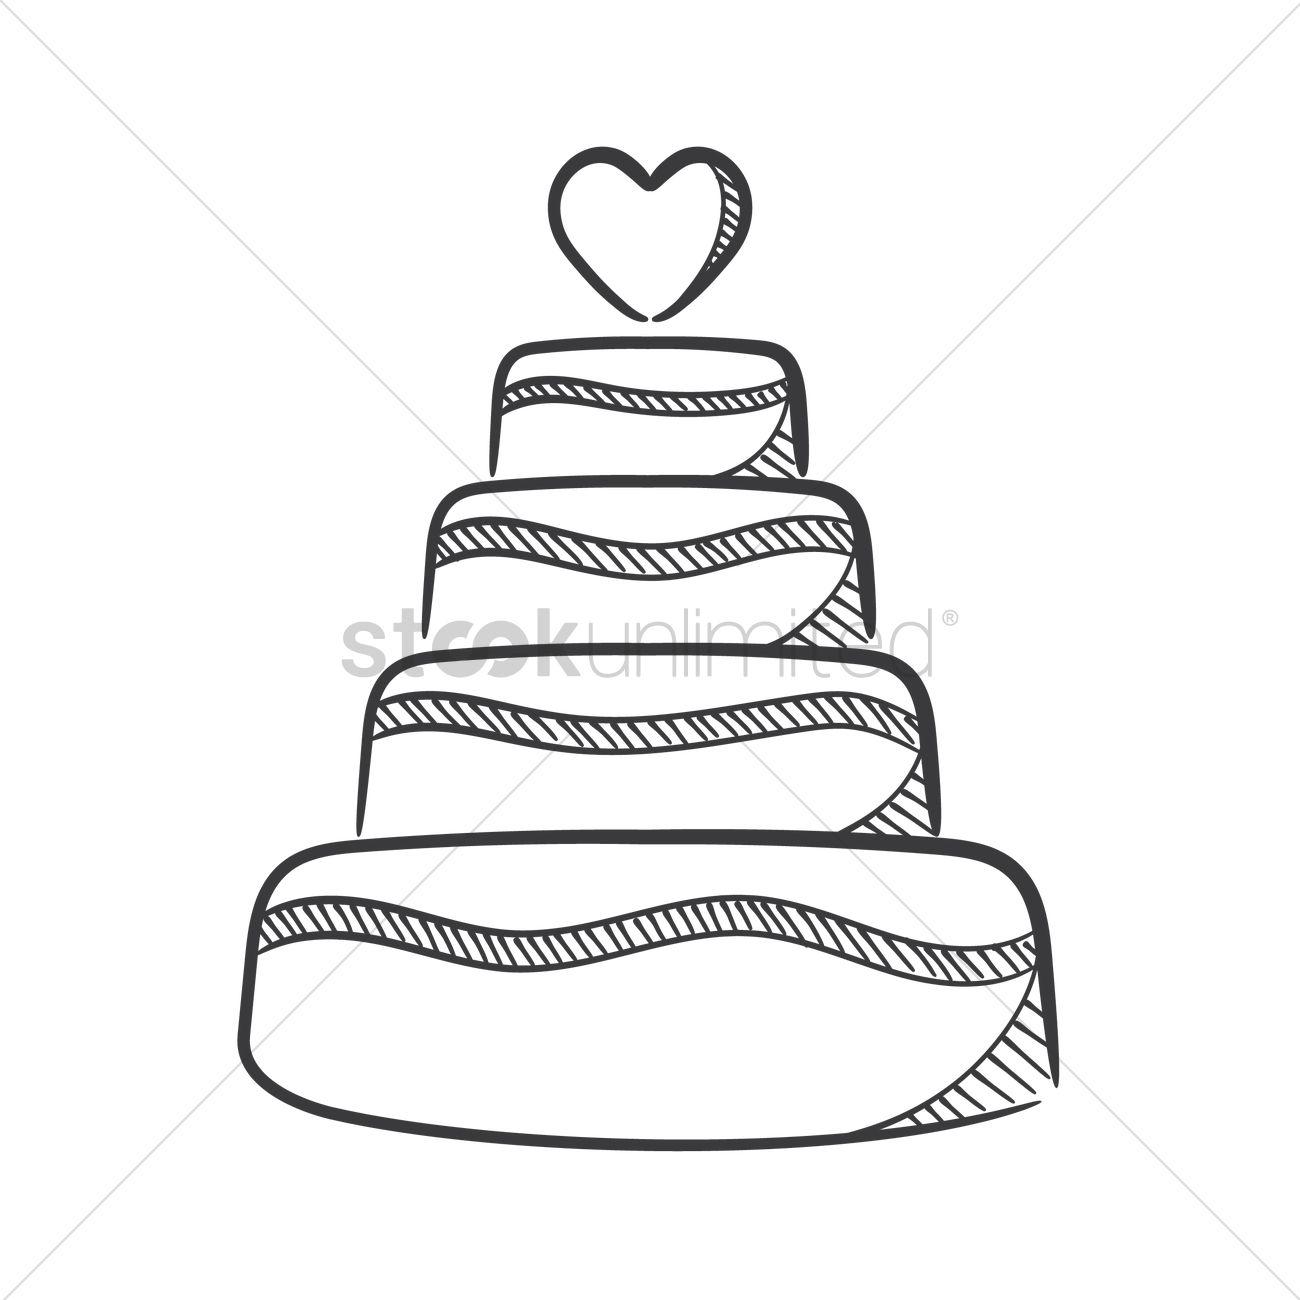 Wedding cake Vector Image - 1637213 StockUnlimited